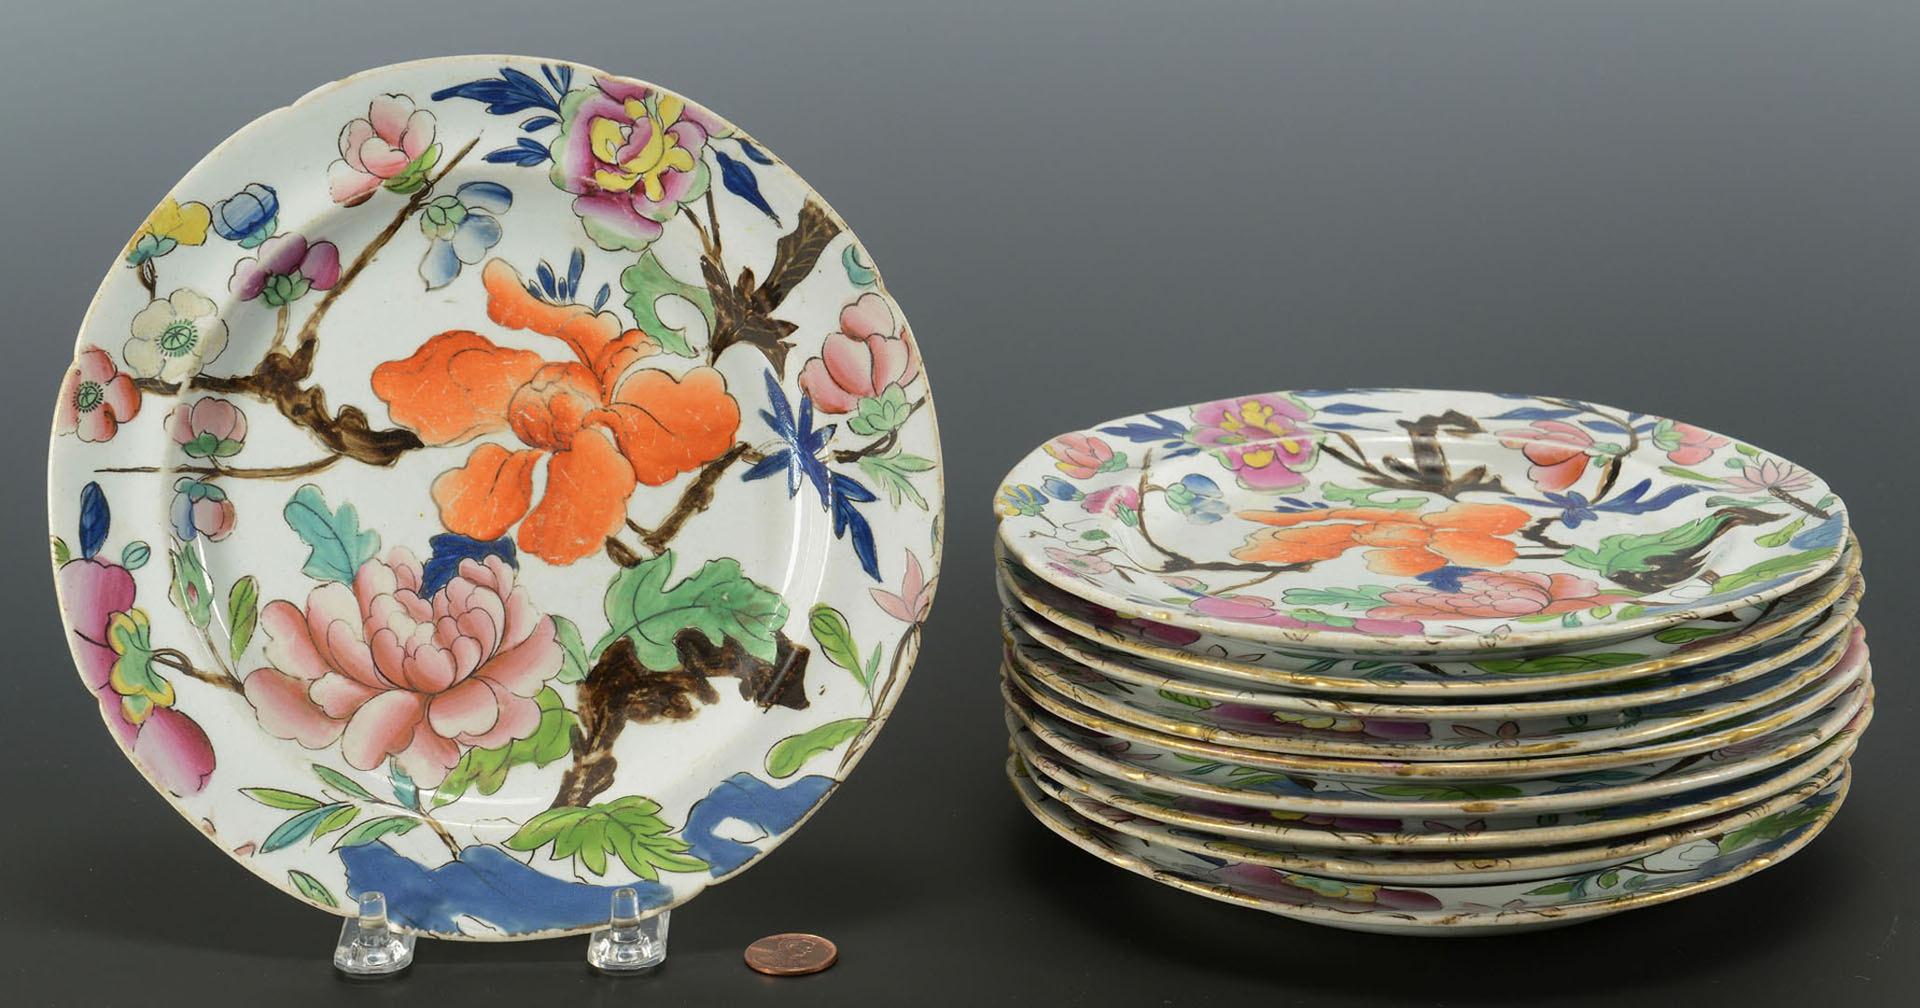 Lot 461: Ten Mason's Imari Ironstone plates, 19th c.